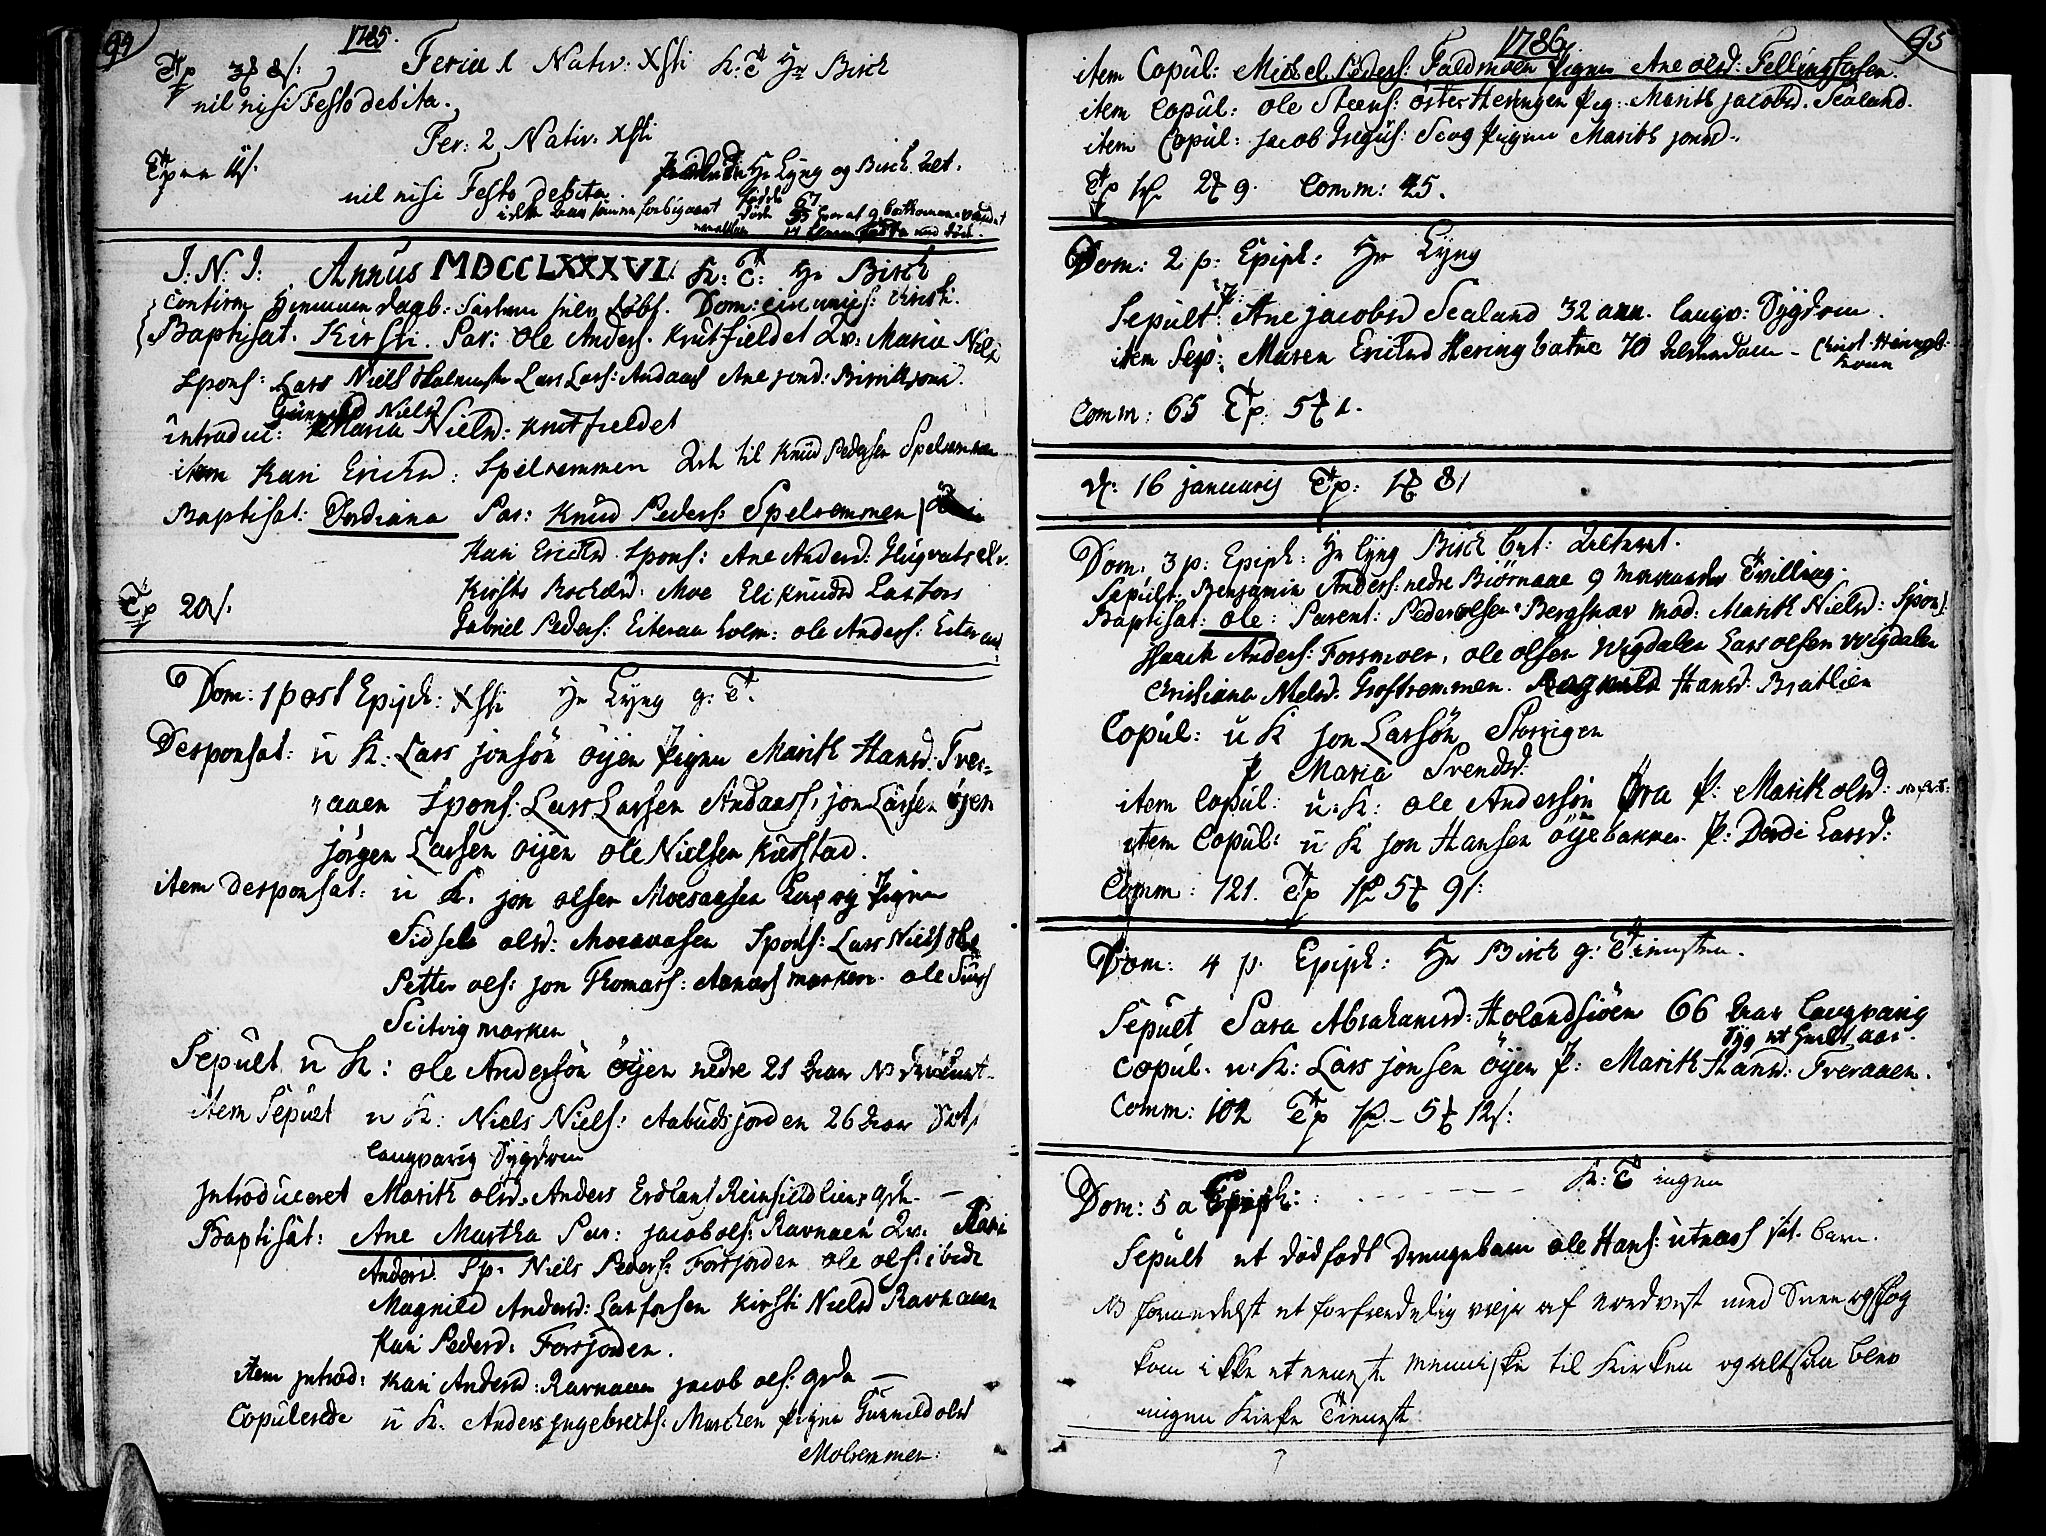 SAT, Ministerialprotokoller, klokkerbøker og fødselsregistre - Nordland, 820/L0286: Ministerialbok nr. 820A07, 1780-1799, s. 94-95